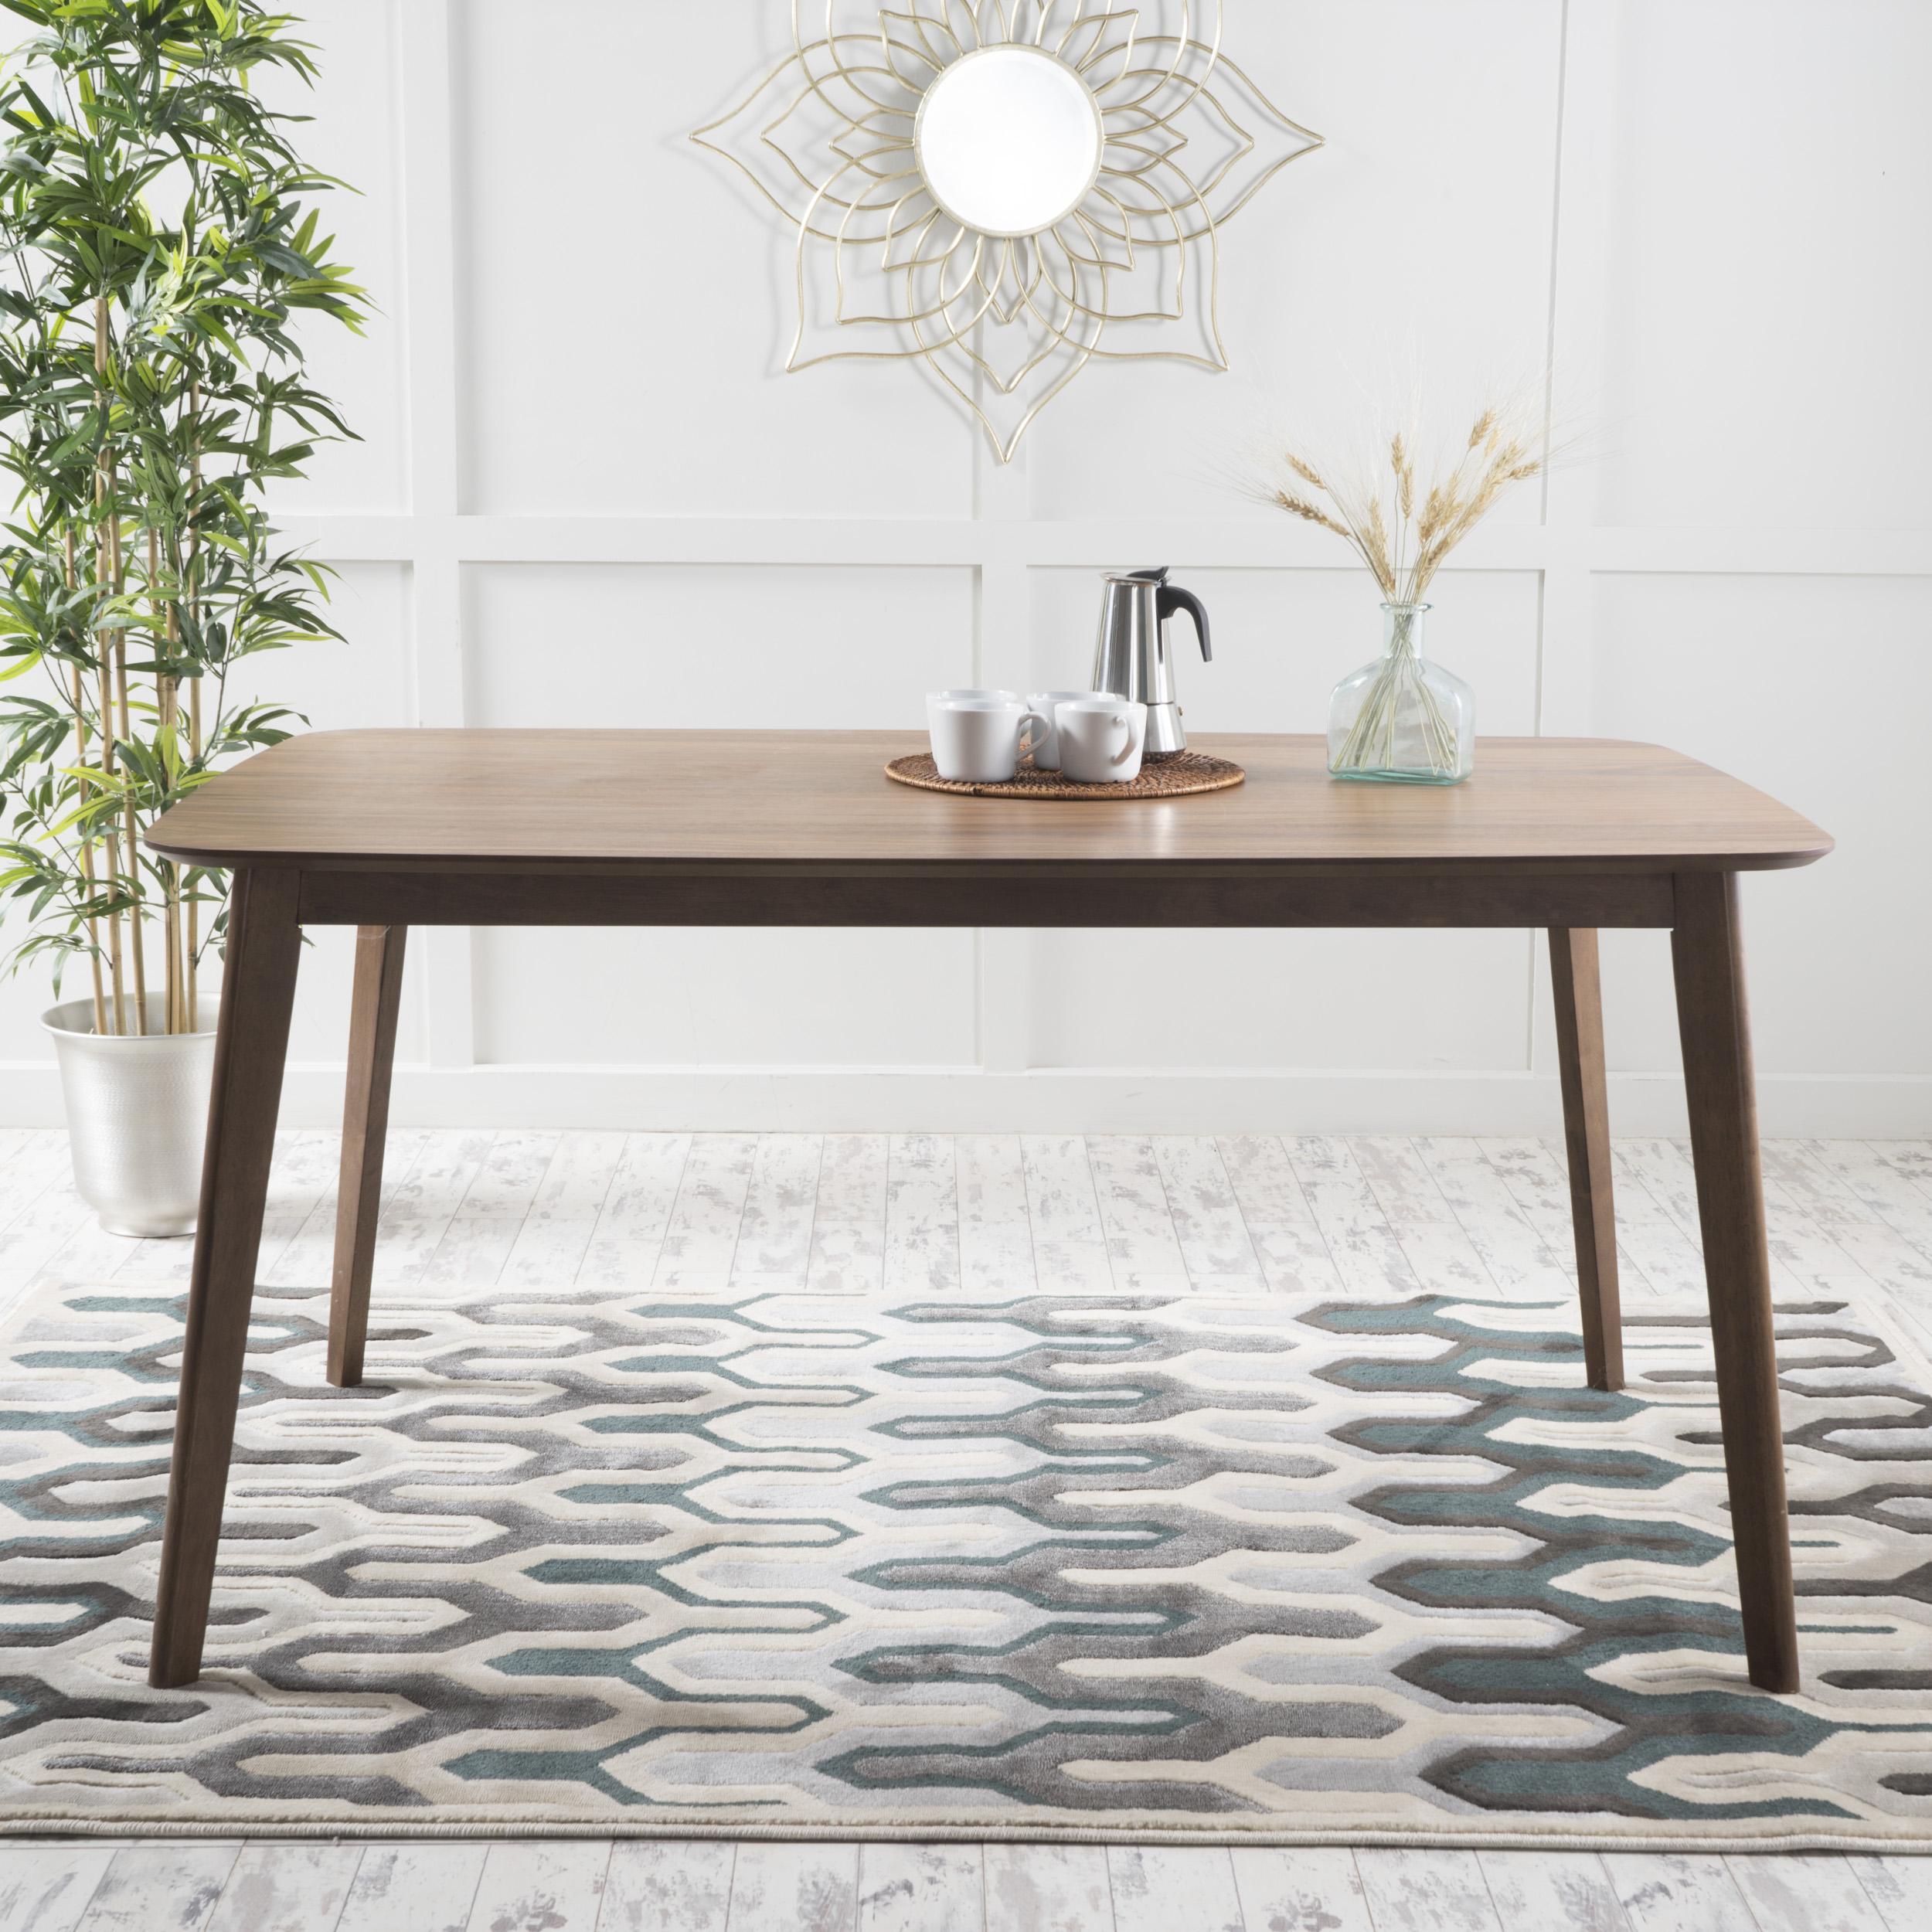 Noble House Natalia Natural Walnut Finish Mid Century Modern Wood Dining  Table